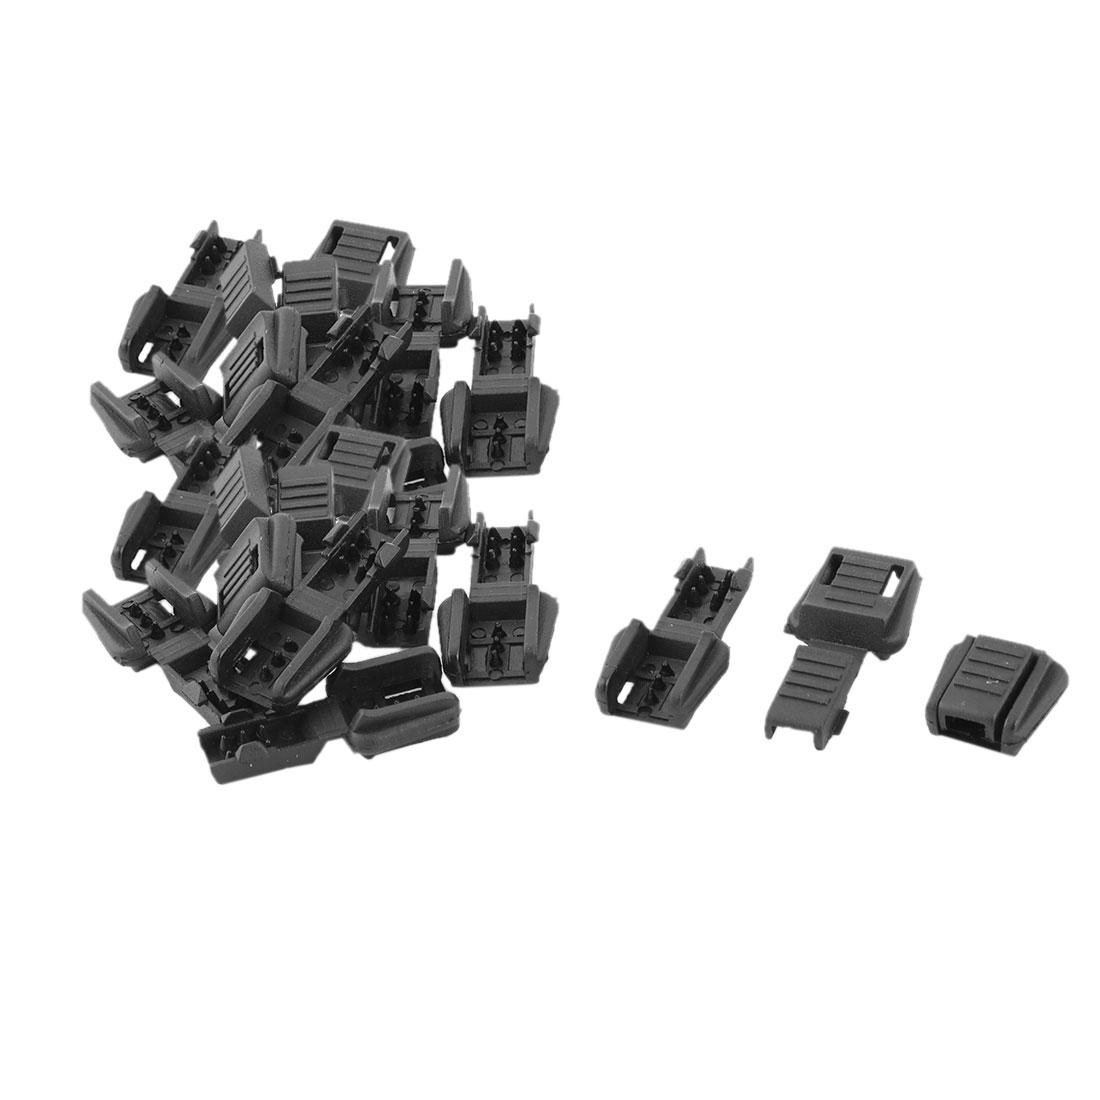 Plastic Single Hole Clothing Cord Rope Lock Clip Clamp Stopper Fastener Black 20pcs